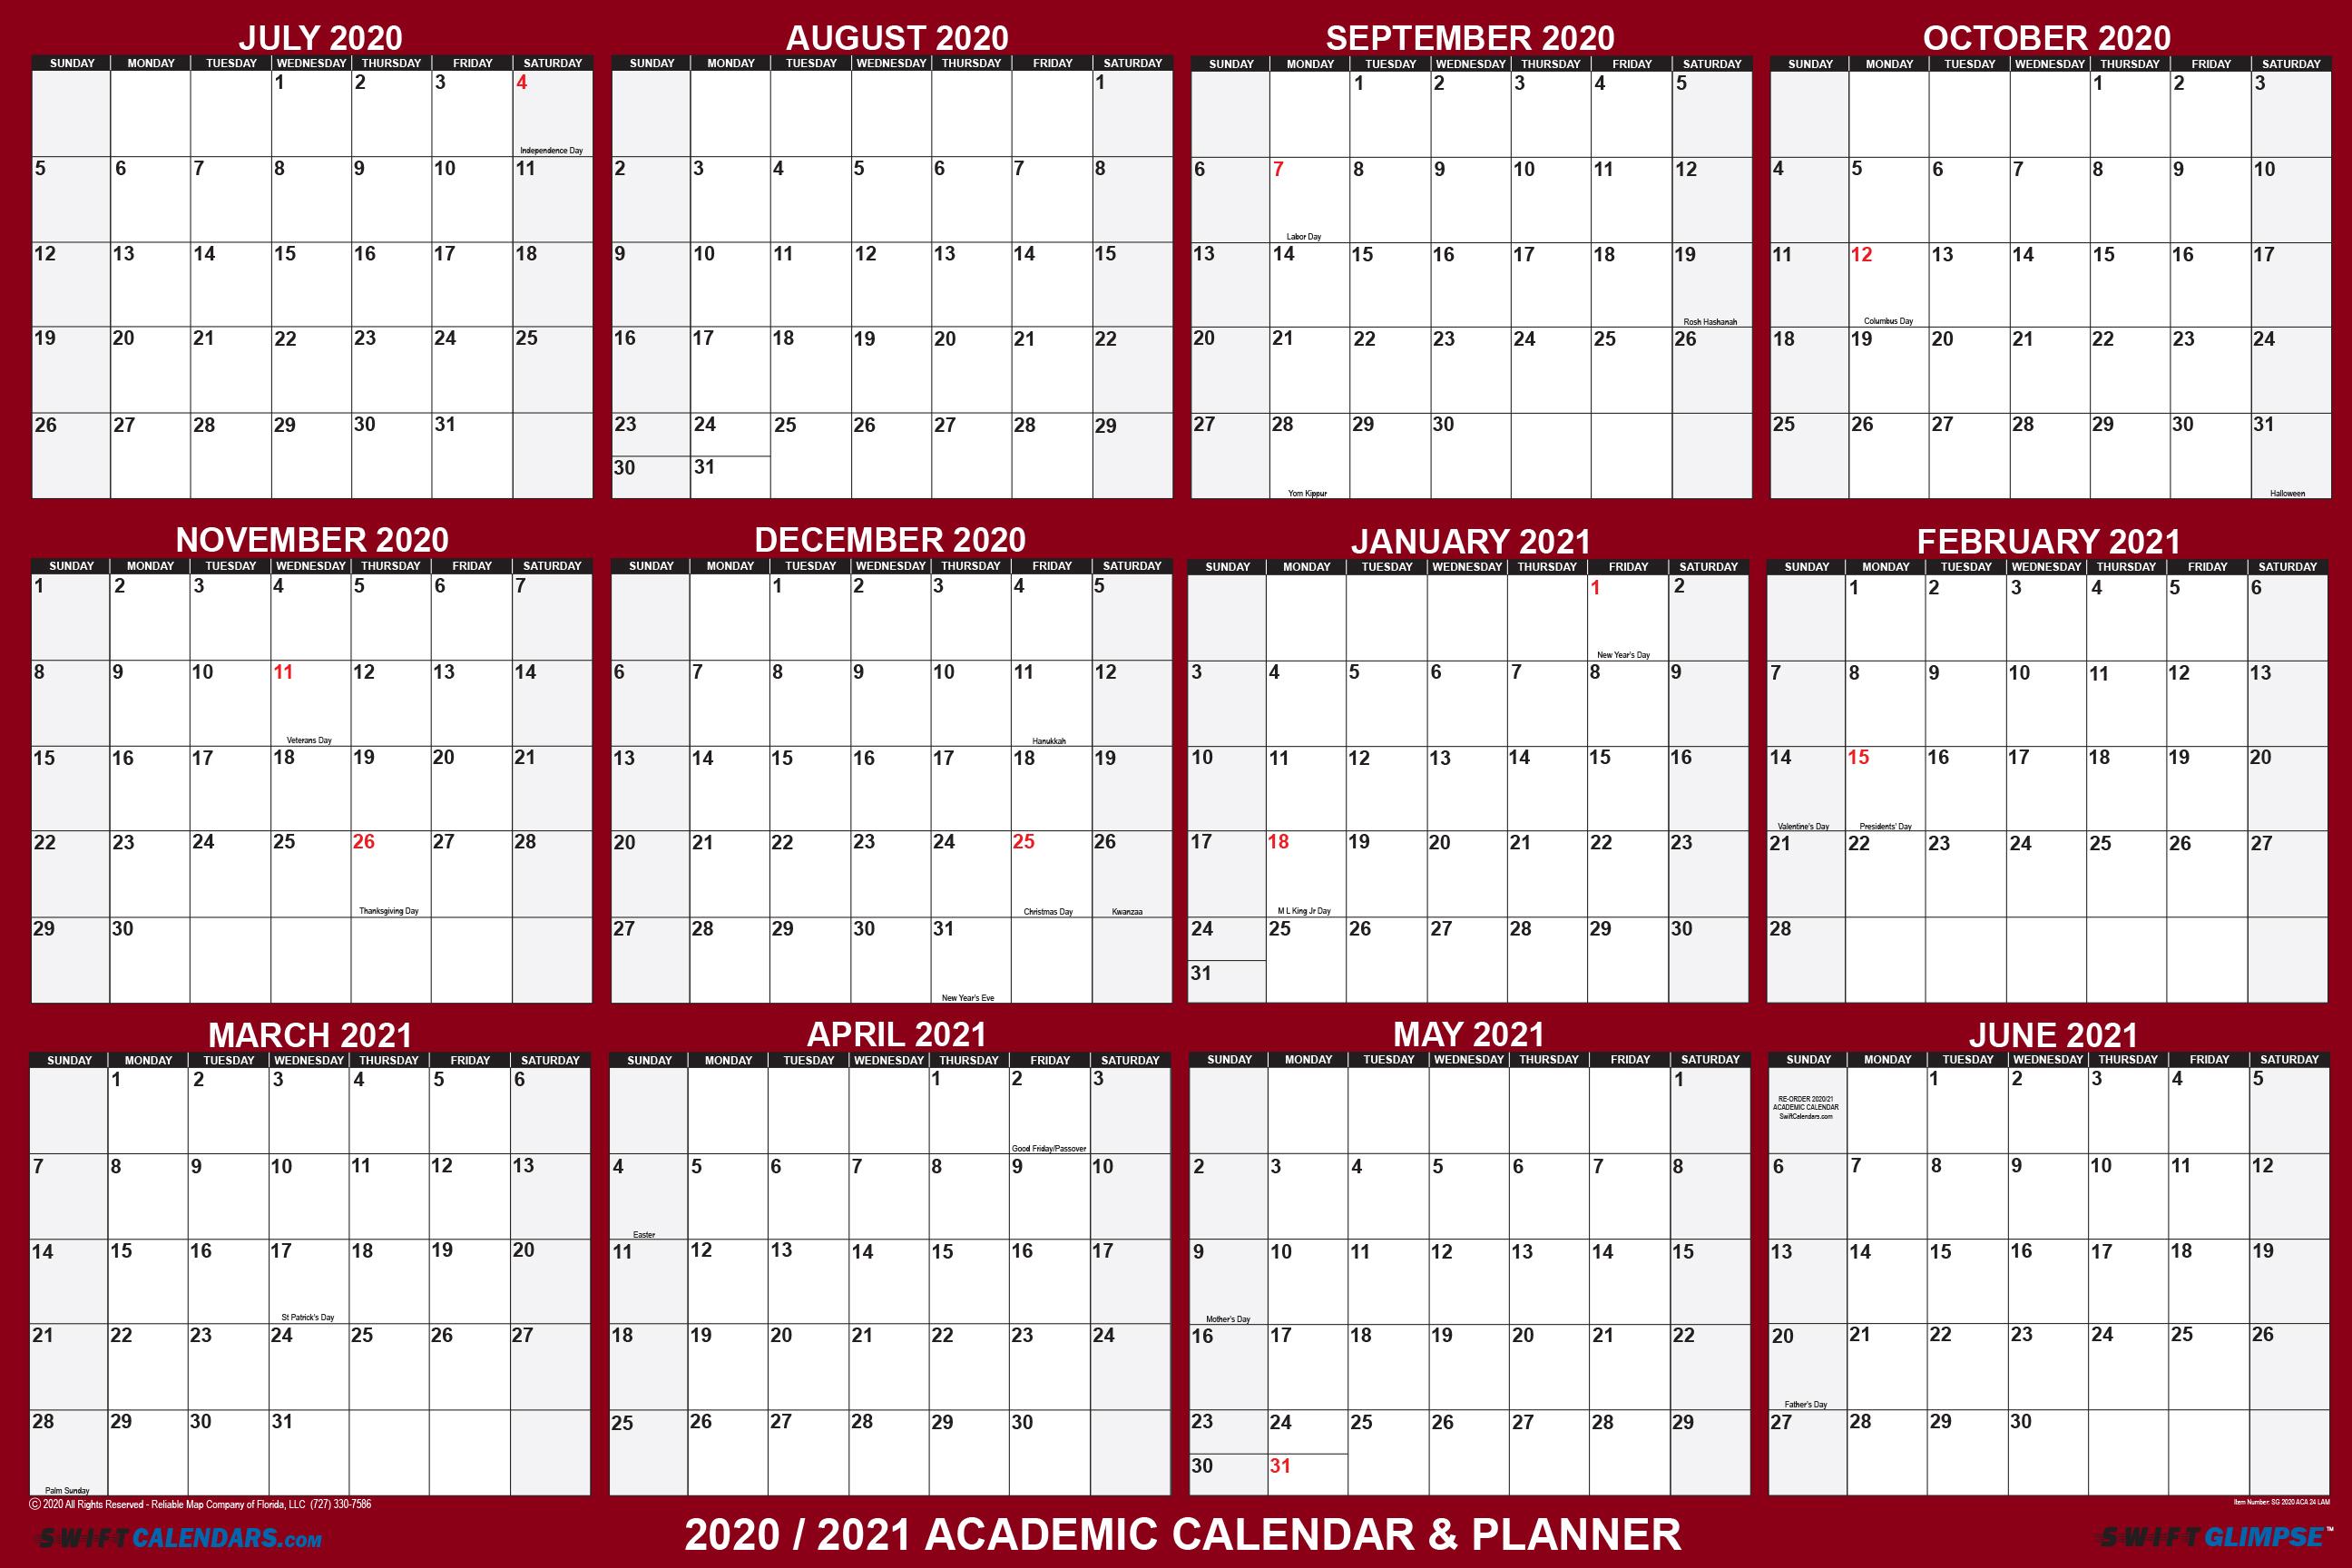 2021 Planning Calendar 2020 2021 Academic Planning Calendar 32